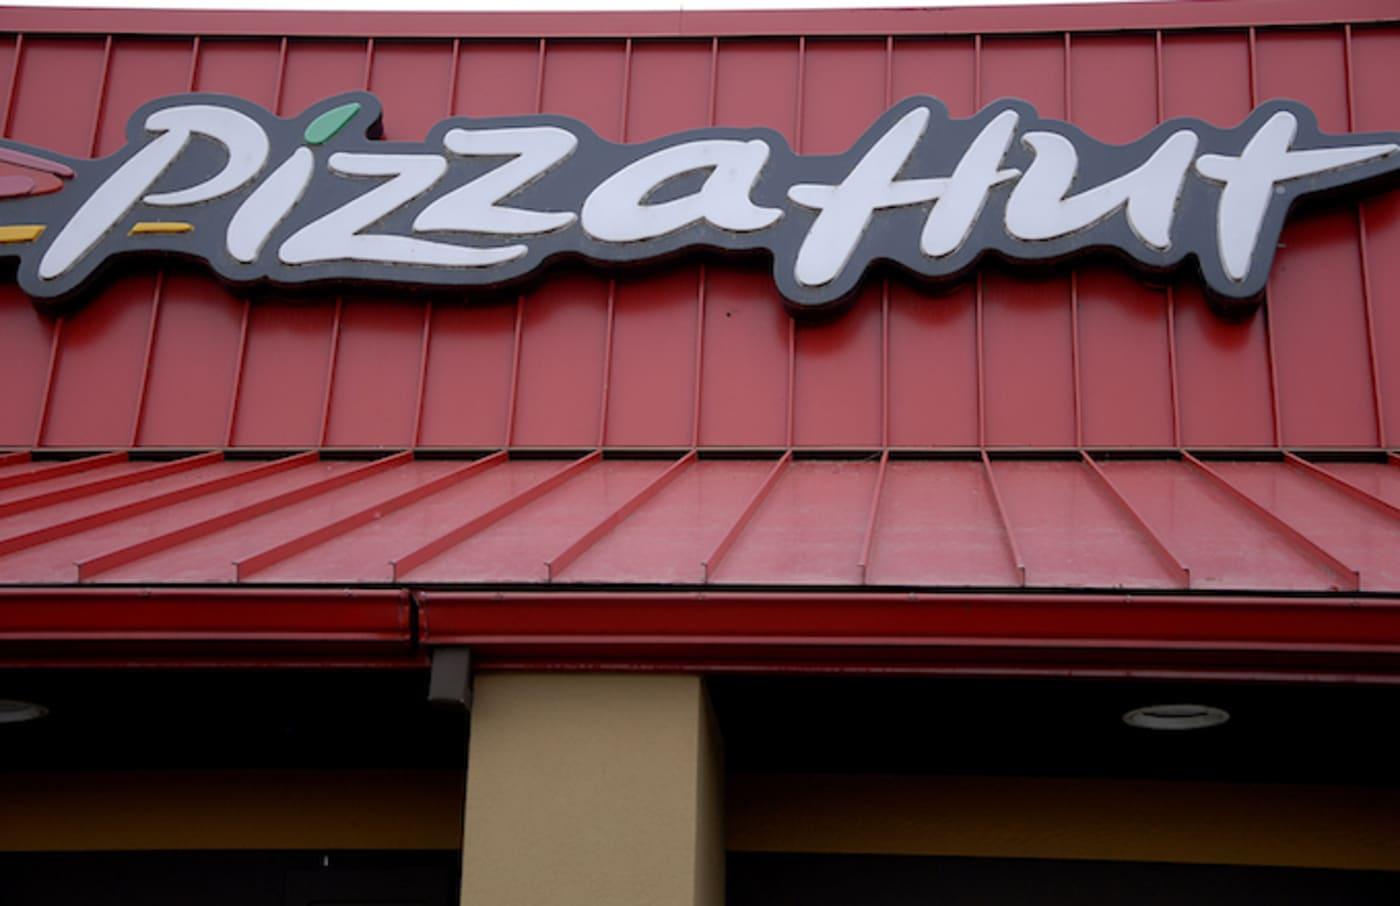 Pizza Hut in Clarkson, Washington.